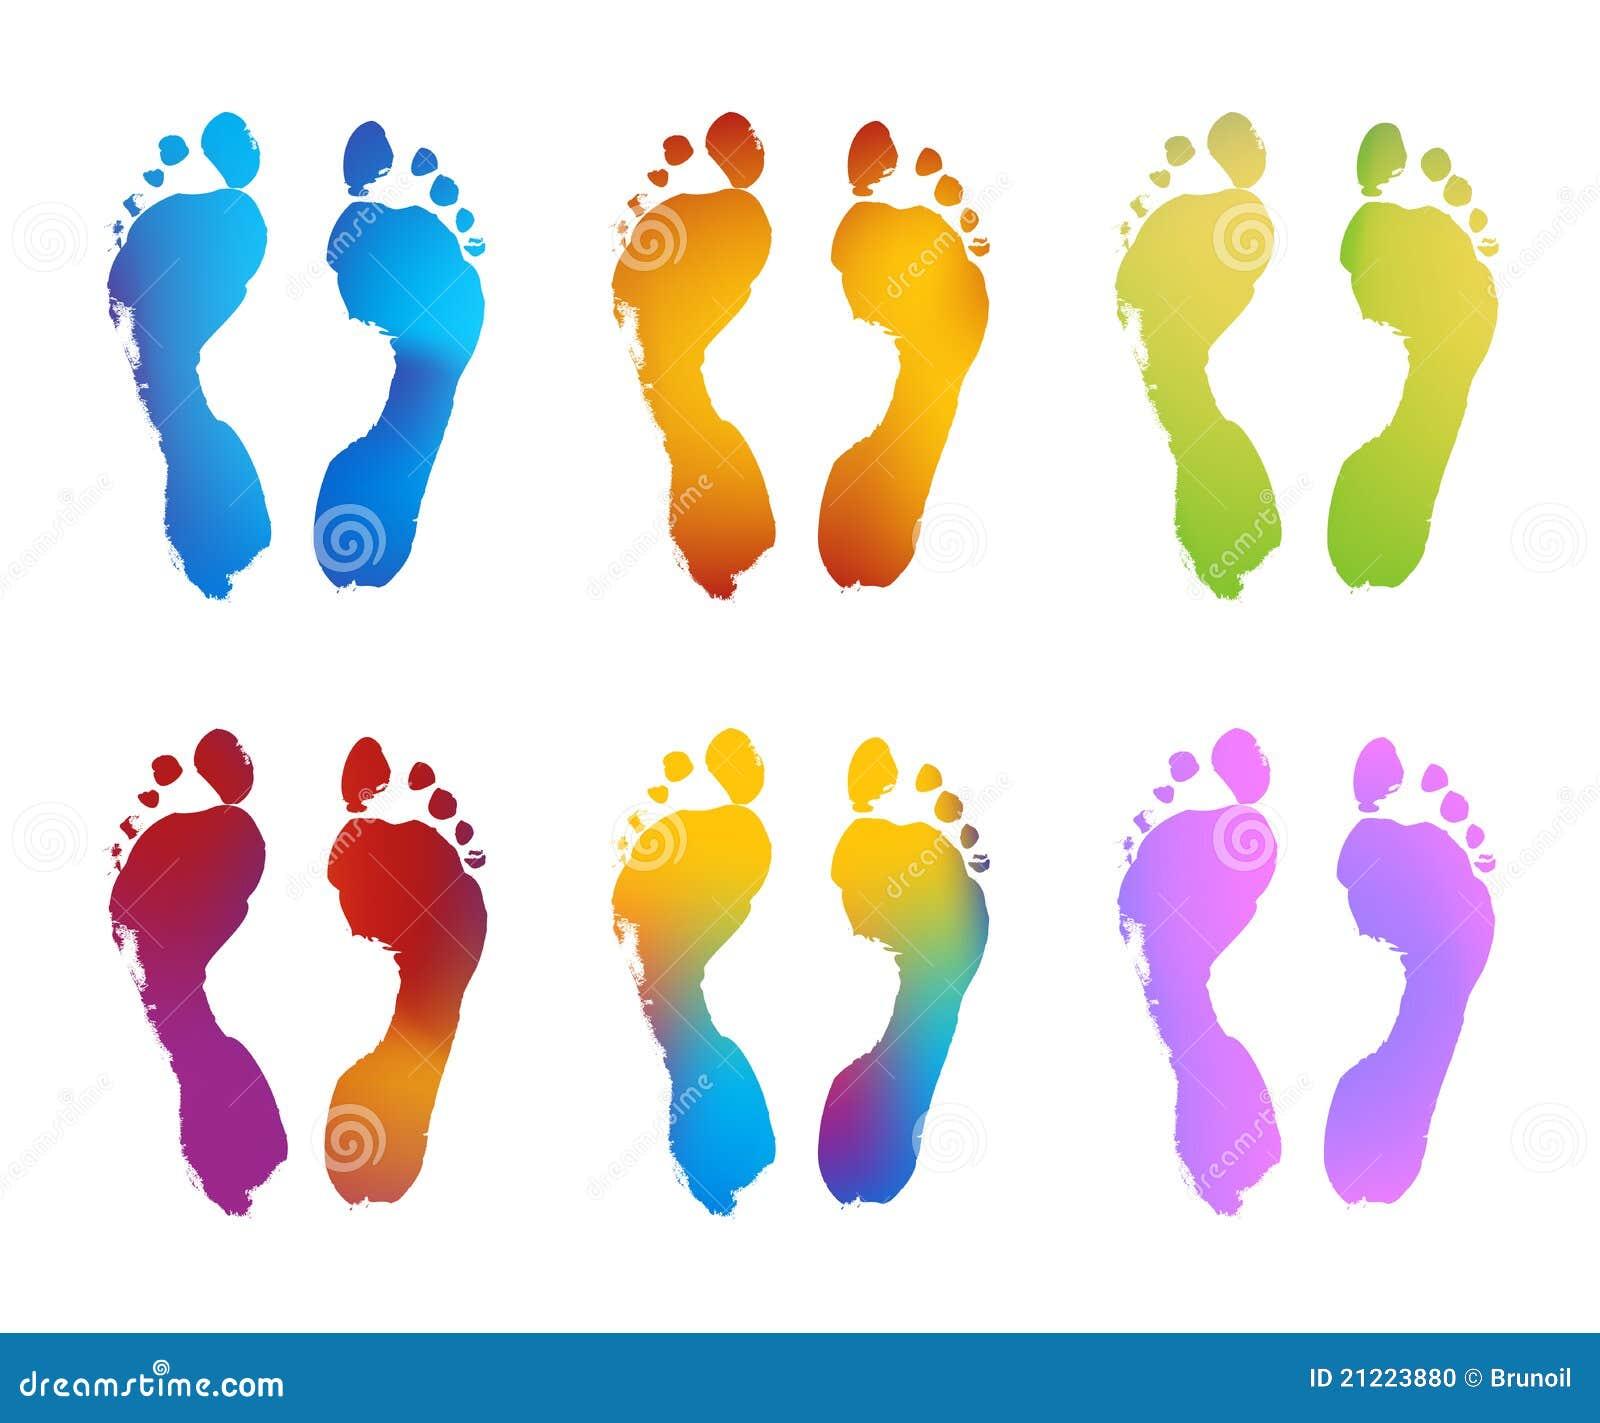 Gradient Color Footprints Stock Photo - Image: 21223880 Стопы Рисунок